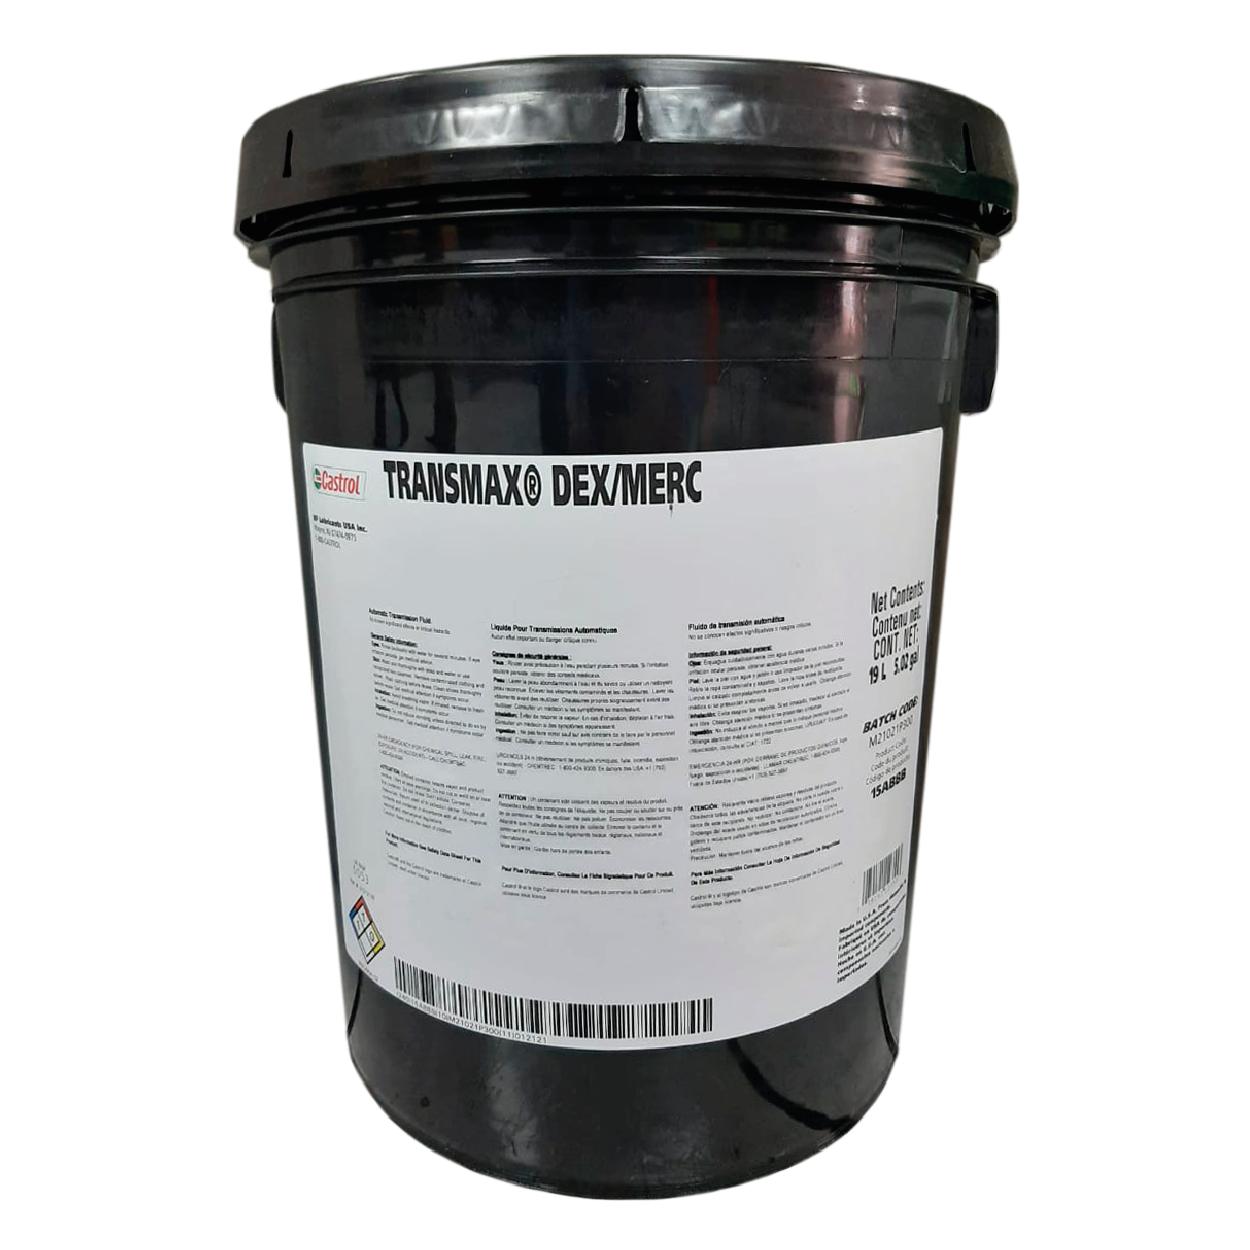 ICAUENG37 TRANSMAX DEX-MERC 5GLN-01